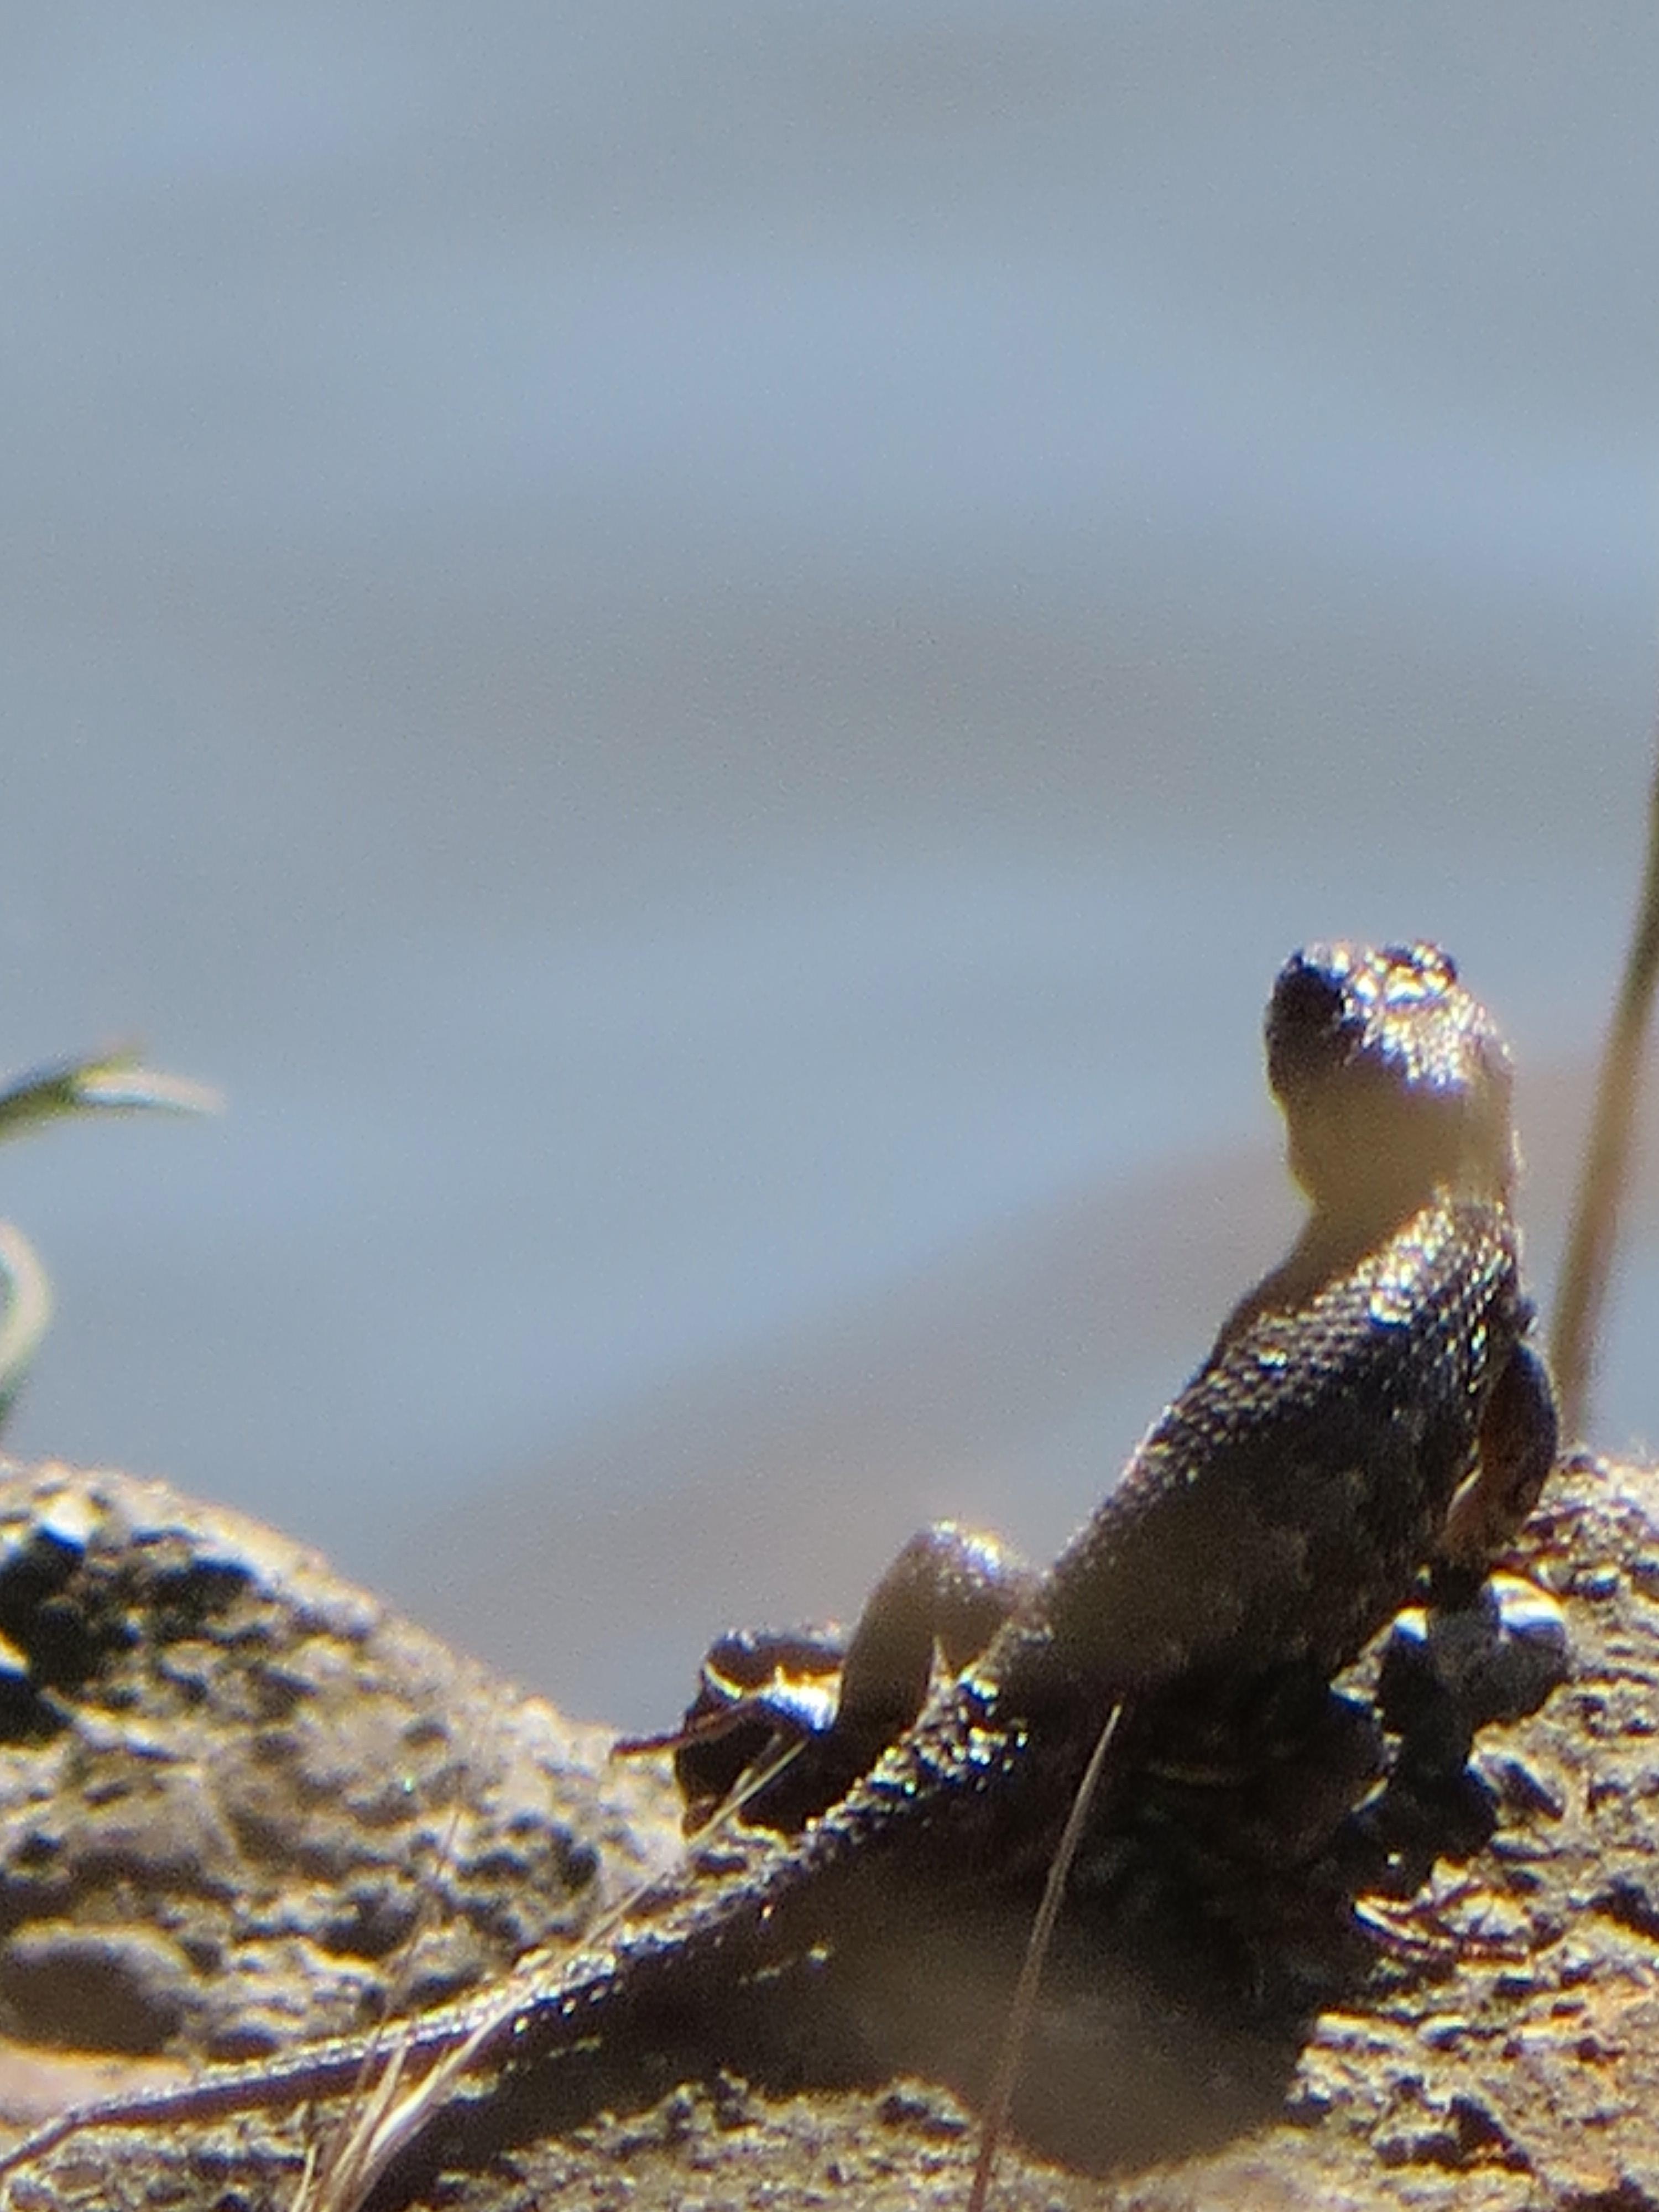 The spy, Animal, Lizard, Reptile, HQ Photo